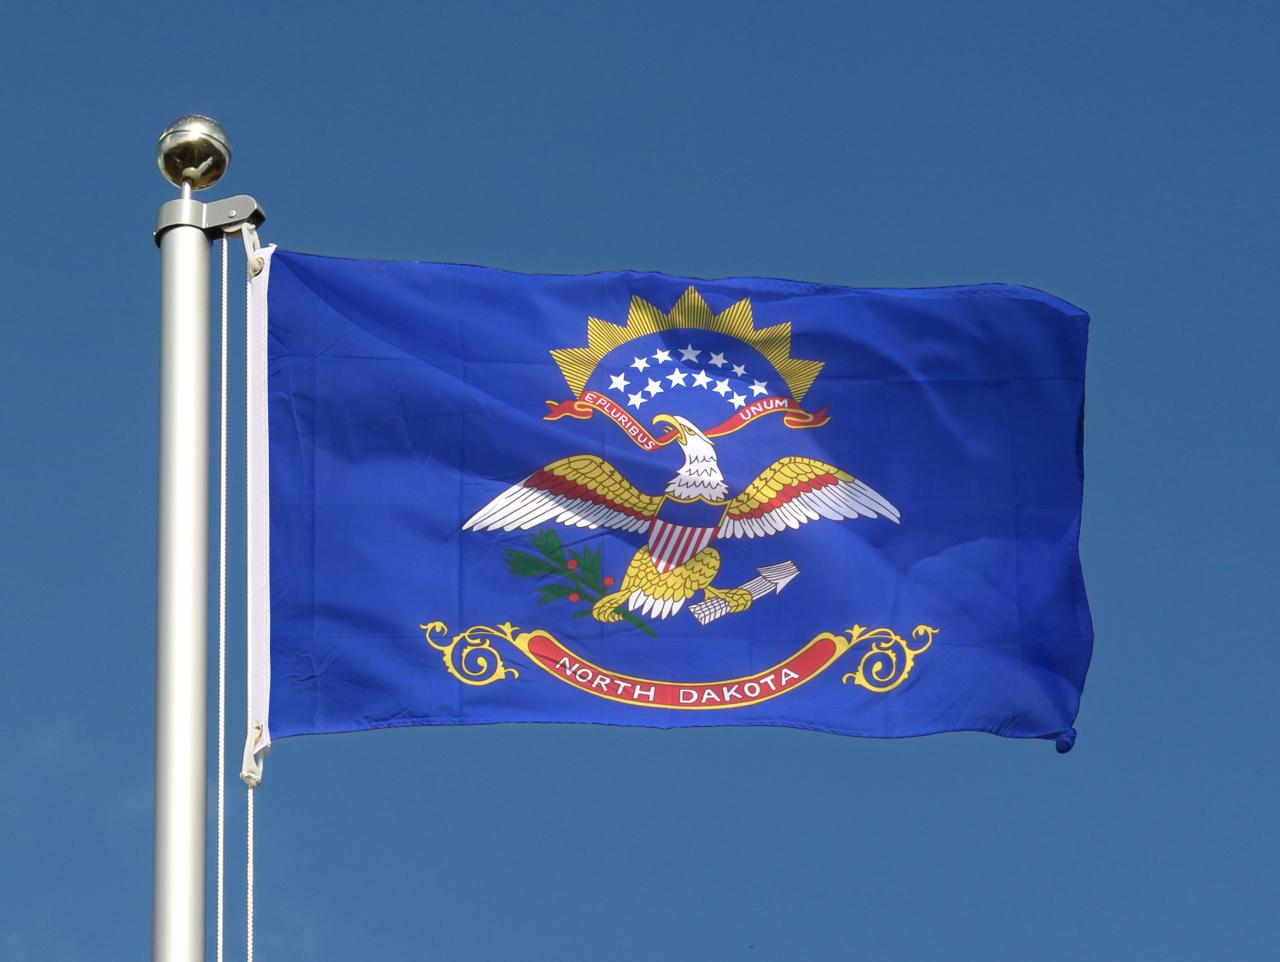 usa north dakota flagge amerikanische fahne 60x90 cm g nstig kaufen. Black Bedroom Furniture Sets. Home Design Ideas